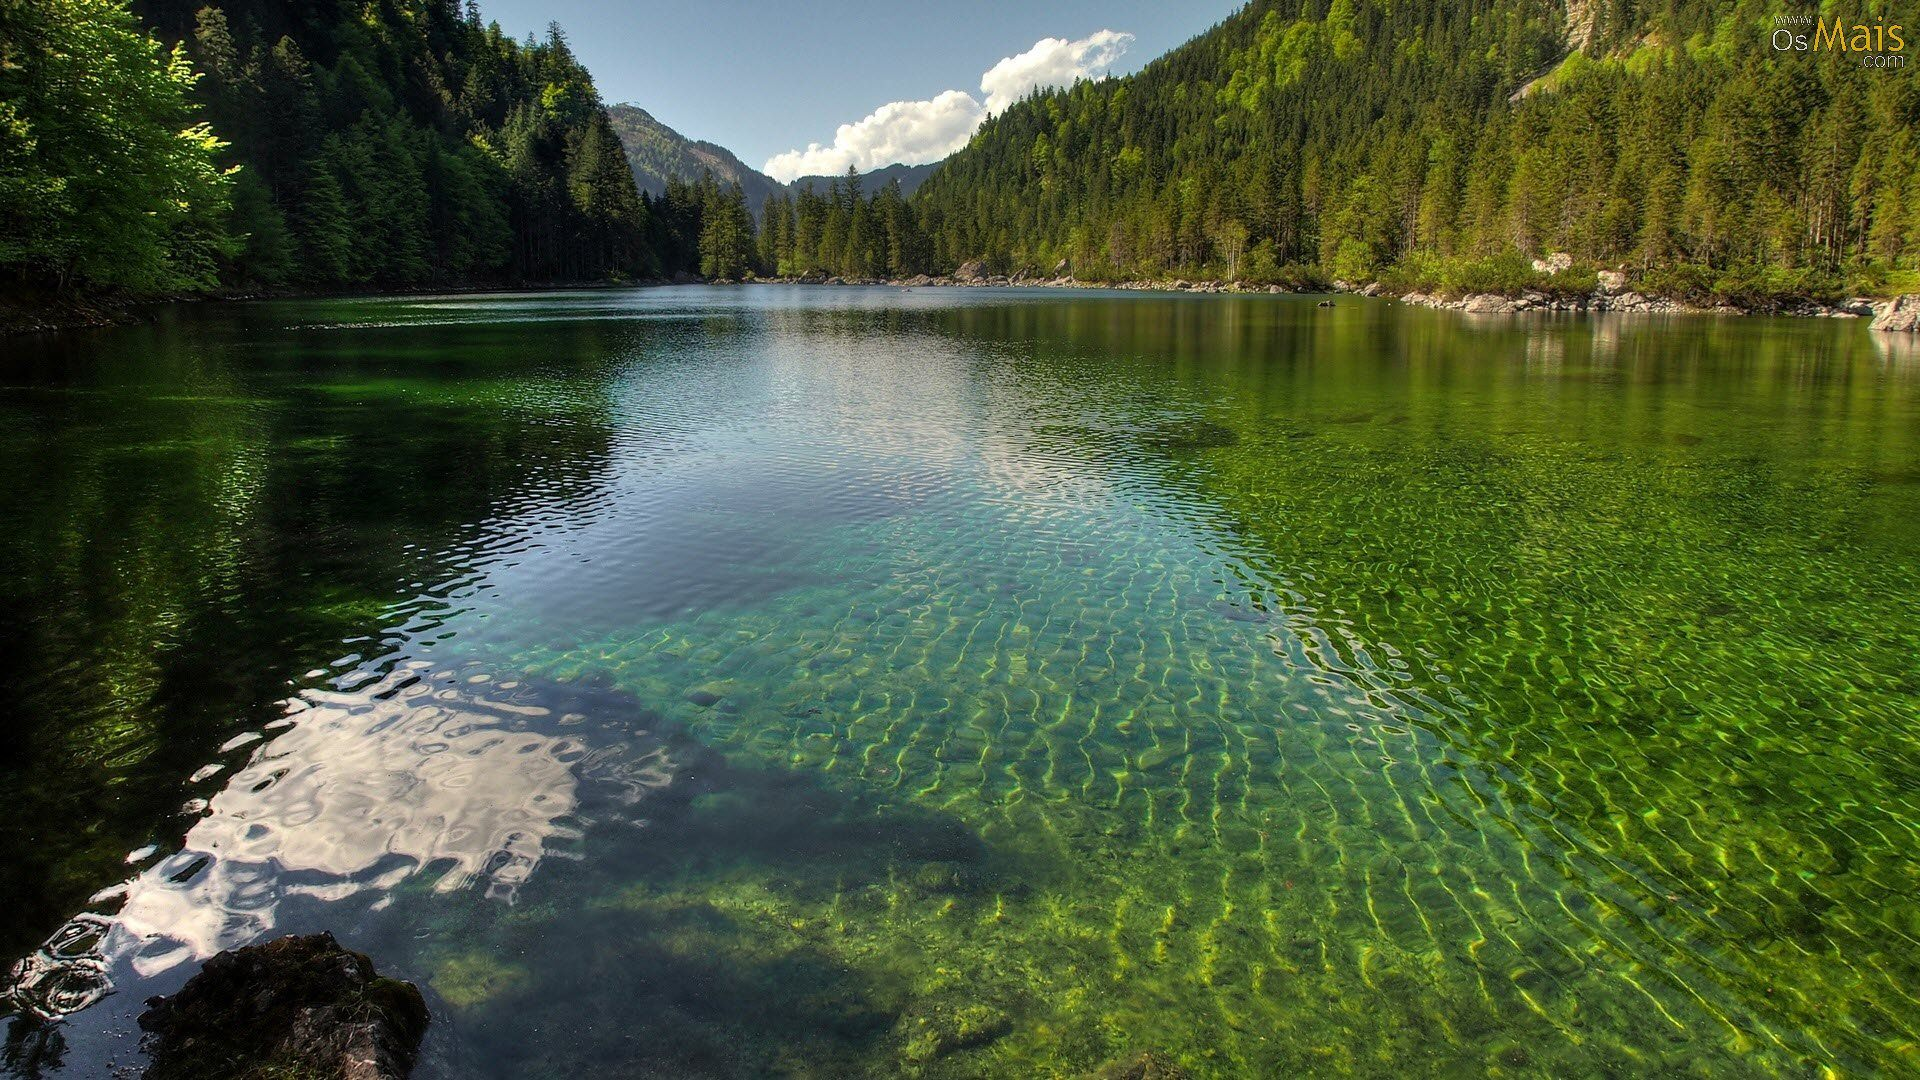 Pin On Eu1 Wallpaper green lake boat mountain fog